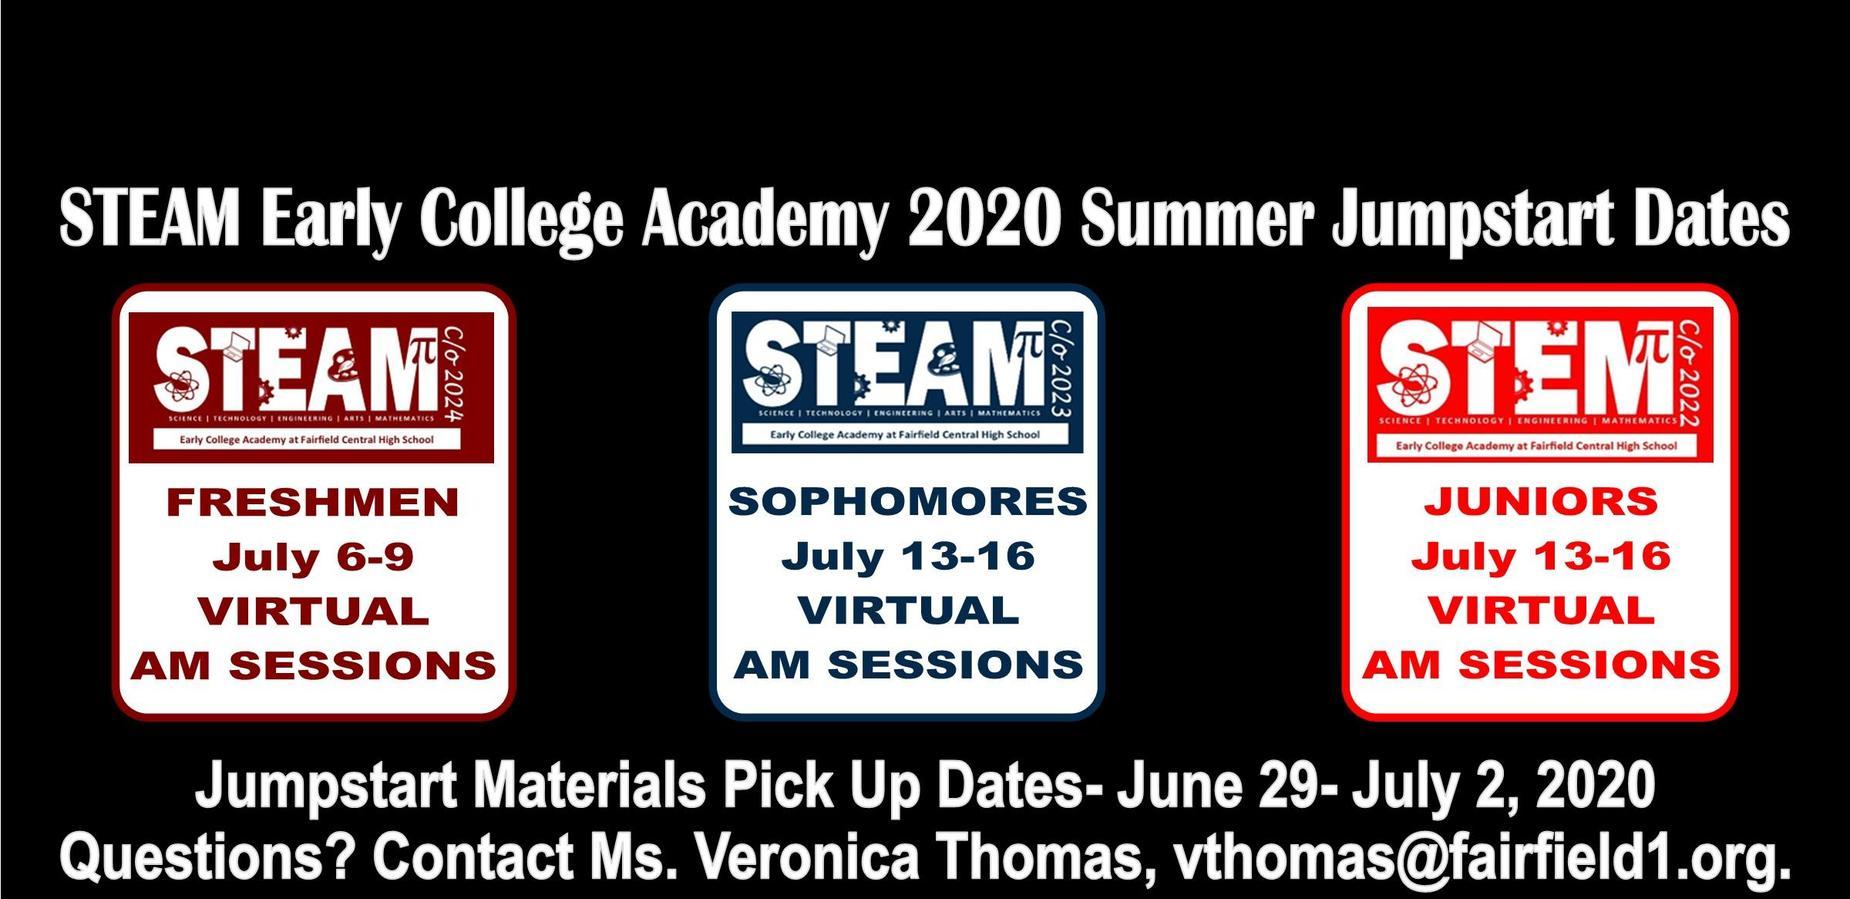 STEAM ECA 2020 Summer Jumpstart Dates